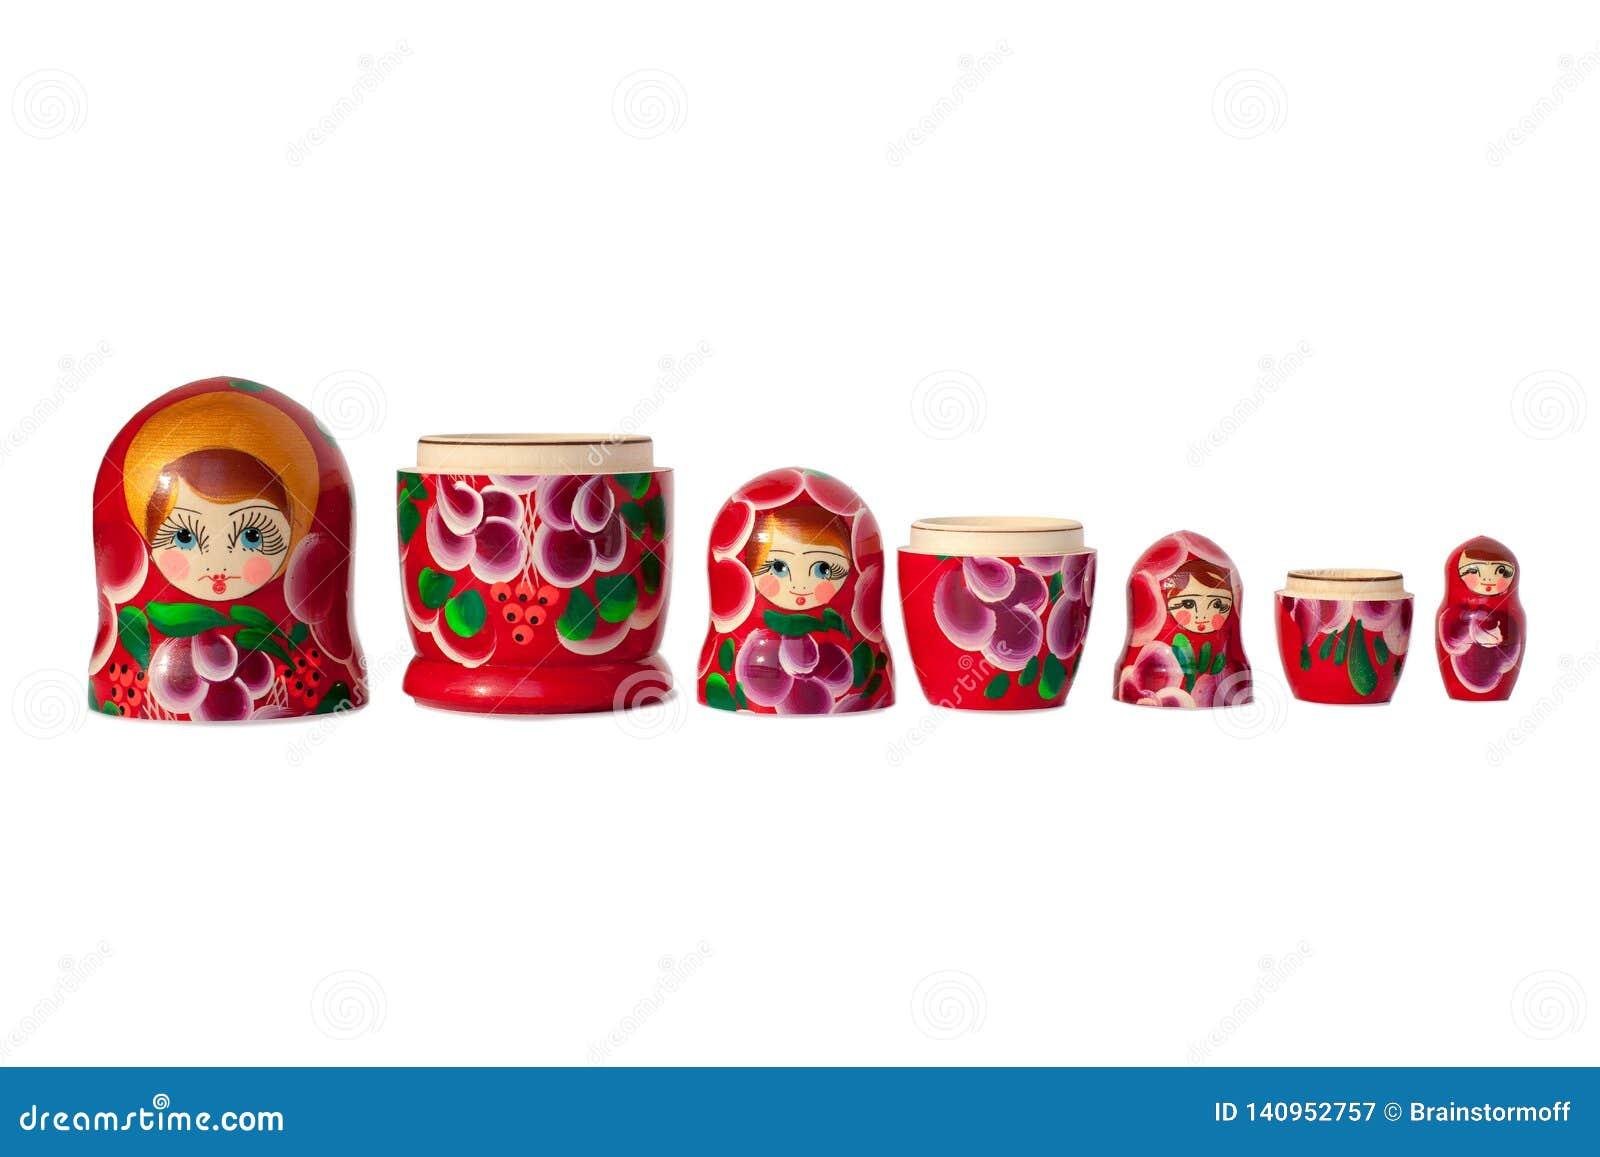 Matreshka ρωσικό κουκλών σχέδιο λουλουδιών αναμνηστικών φωτεινό κόκκινο, πορφυρό και πράσινο στην άσπρη απομονωμένη υπόβαθρο κινη